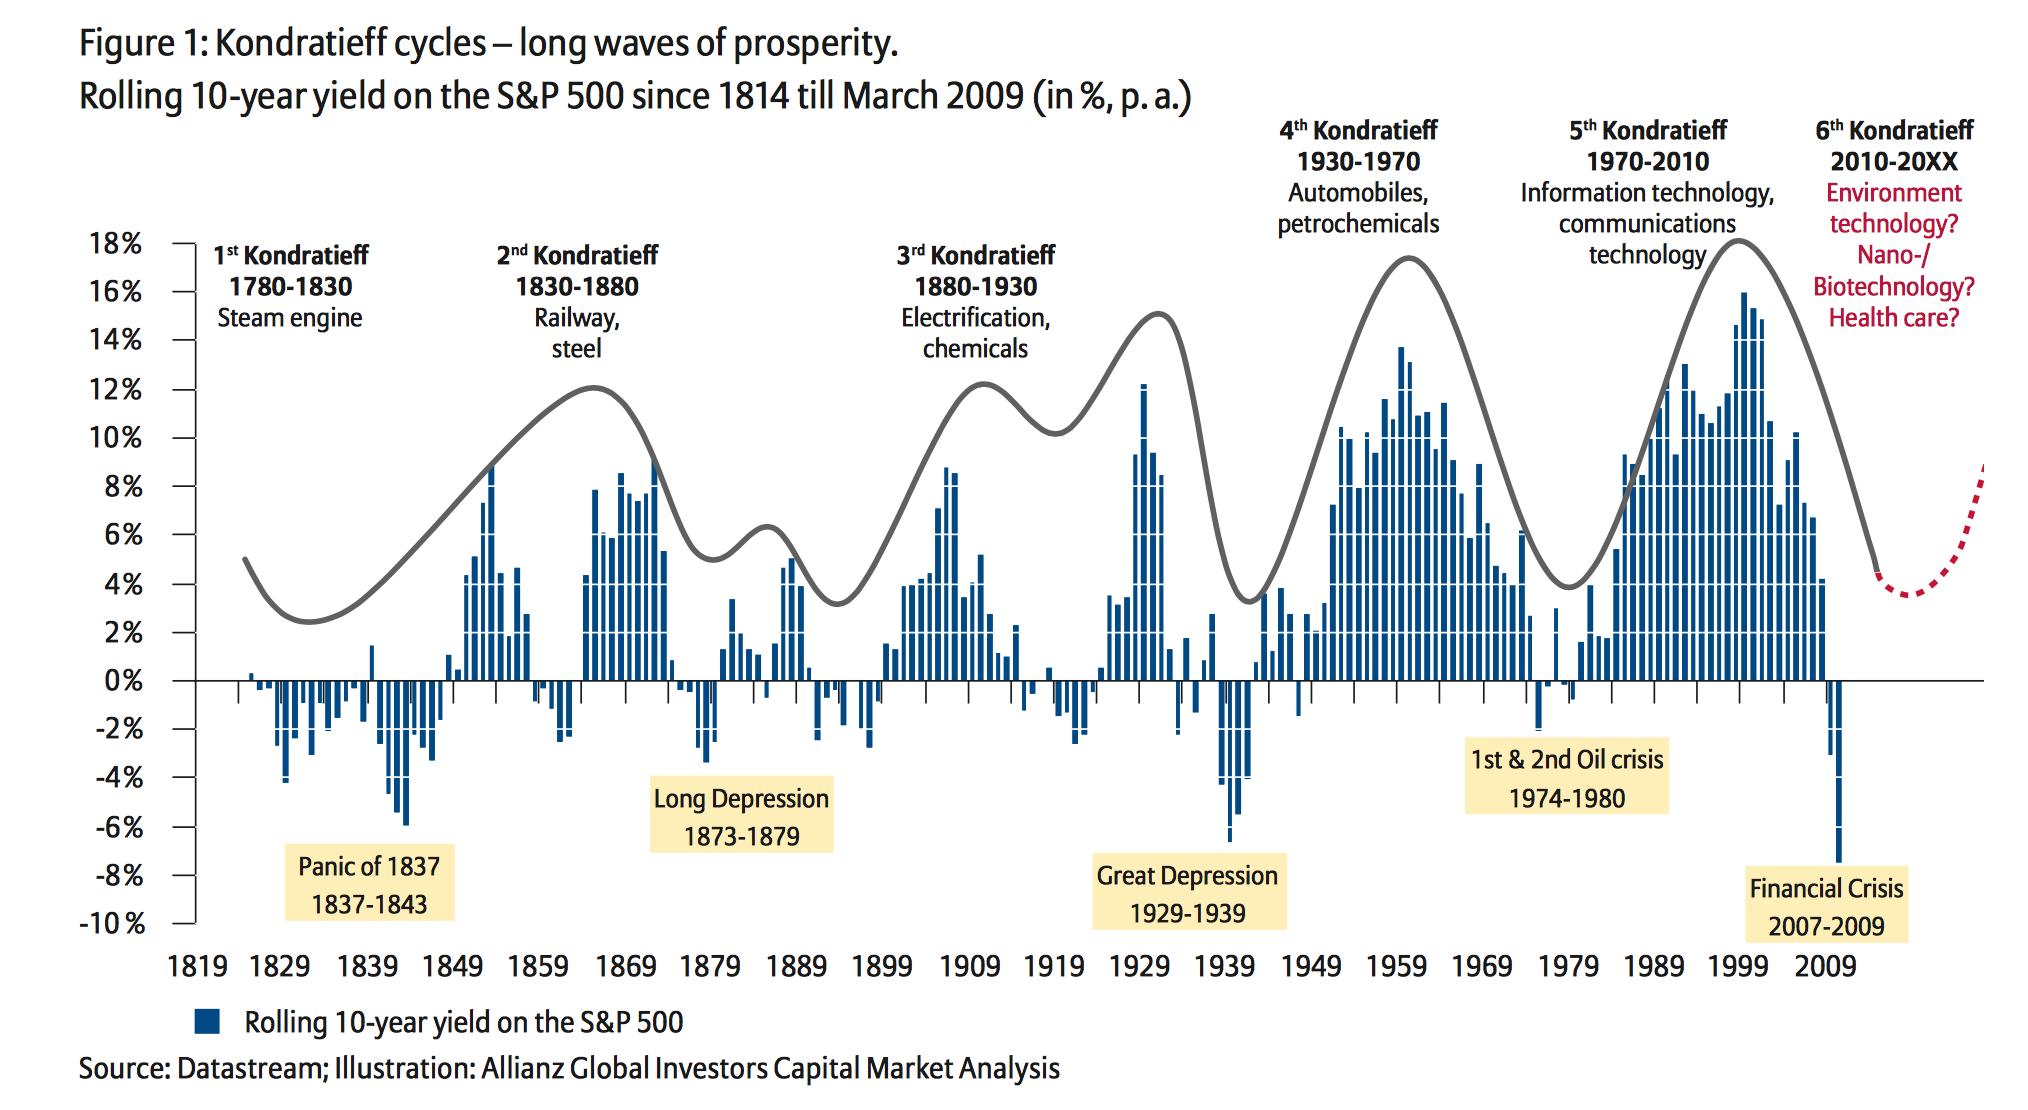 Kondratieff Cycles and long waves of prosperity (Riddhi Sheth Dash)